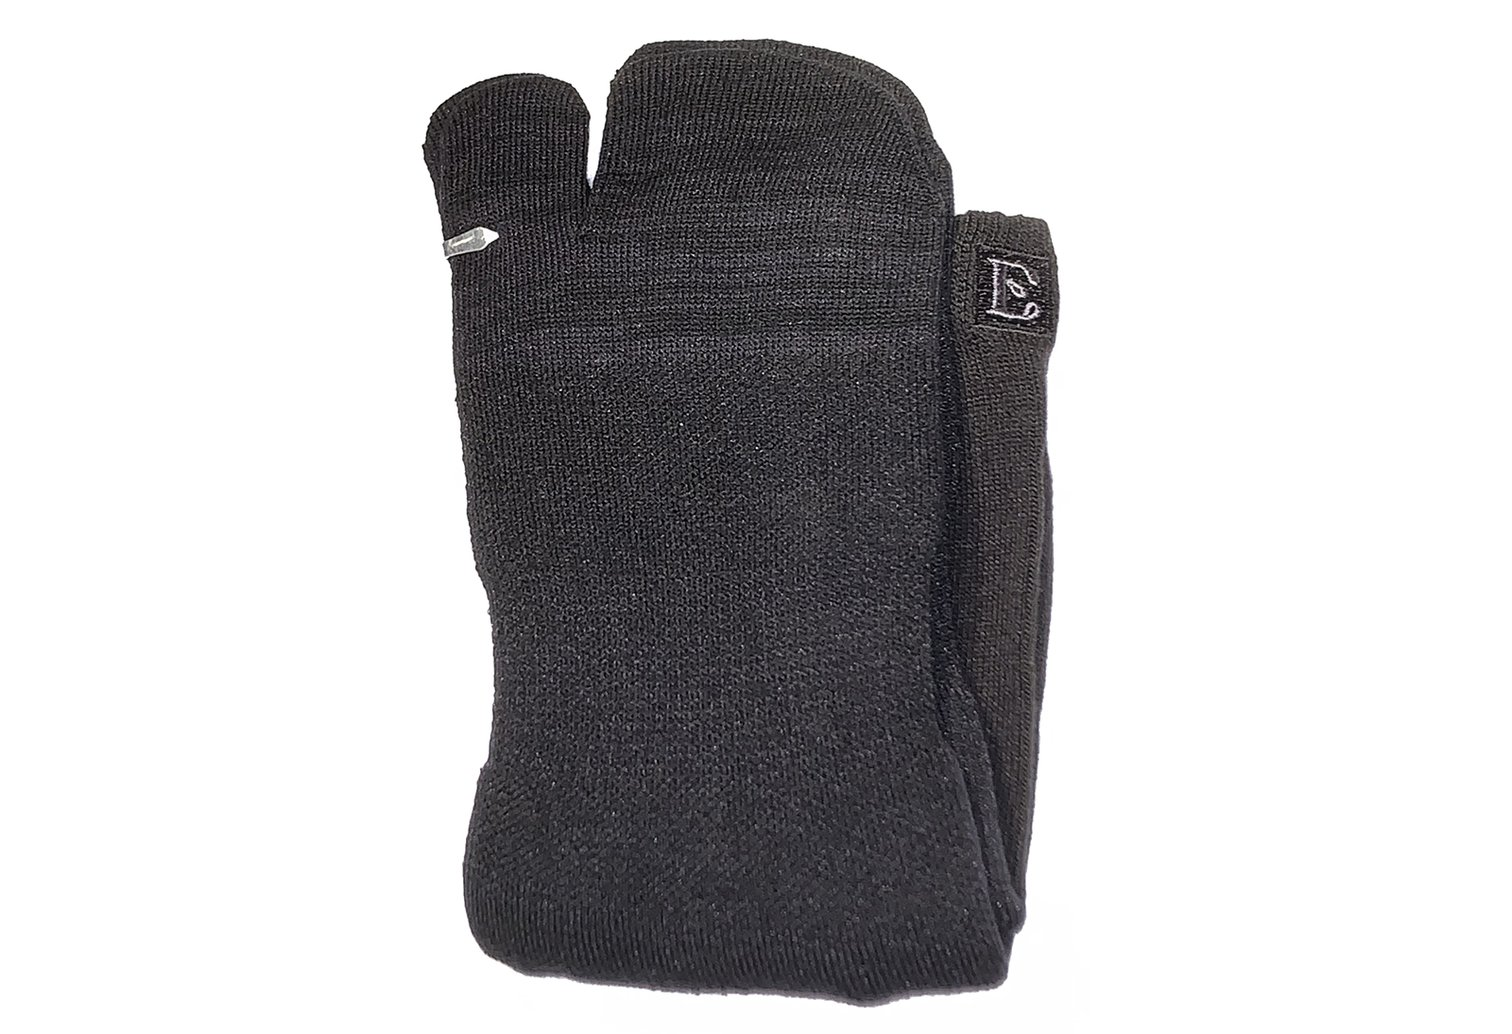 Crew Wool Tabi Socks - Black Picture 8